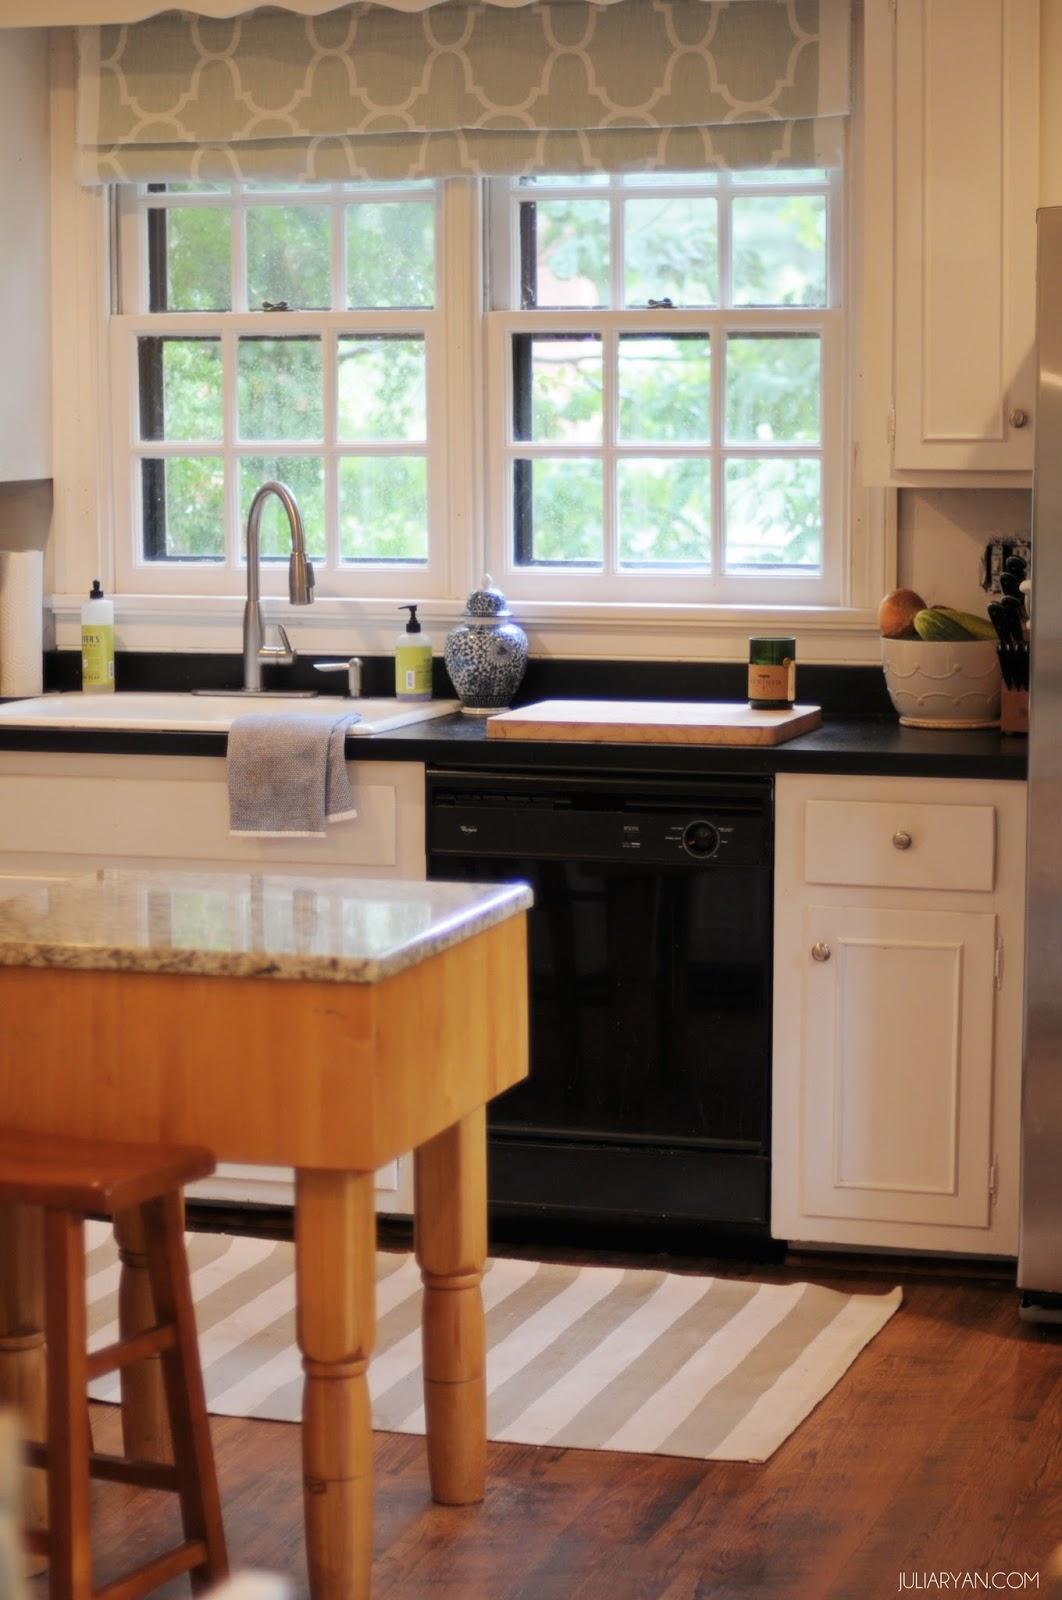 new house progress kitchen window treatments julia ryan. Black Bedroom Furniture Sets. Home Design Ideas